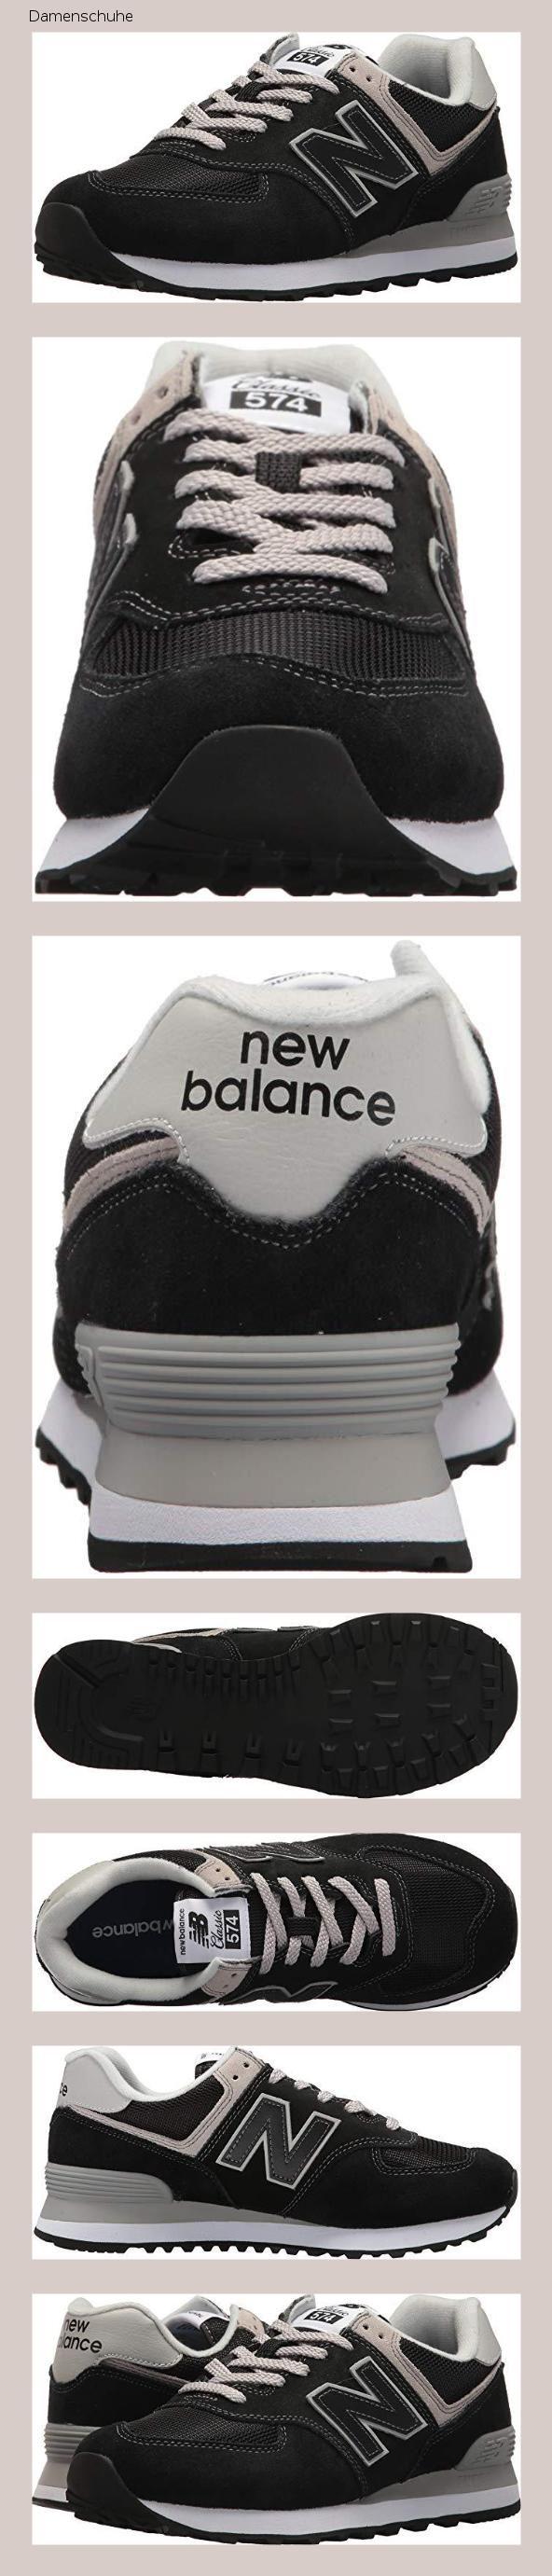 New Balance Damen 574v2 Core Sneaker | Damenschuhe in 2019 ...